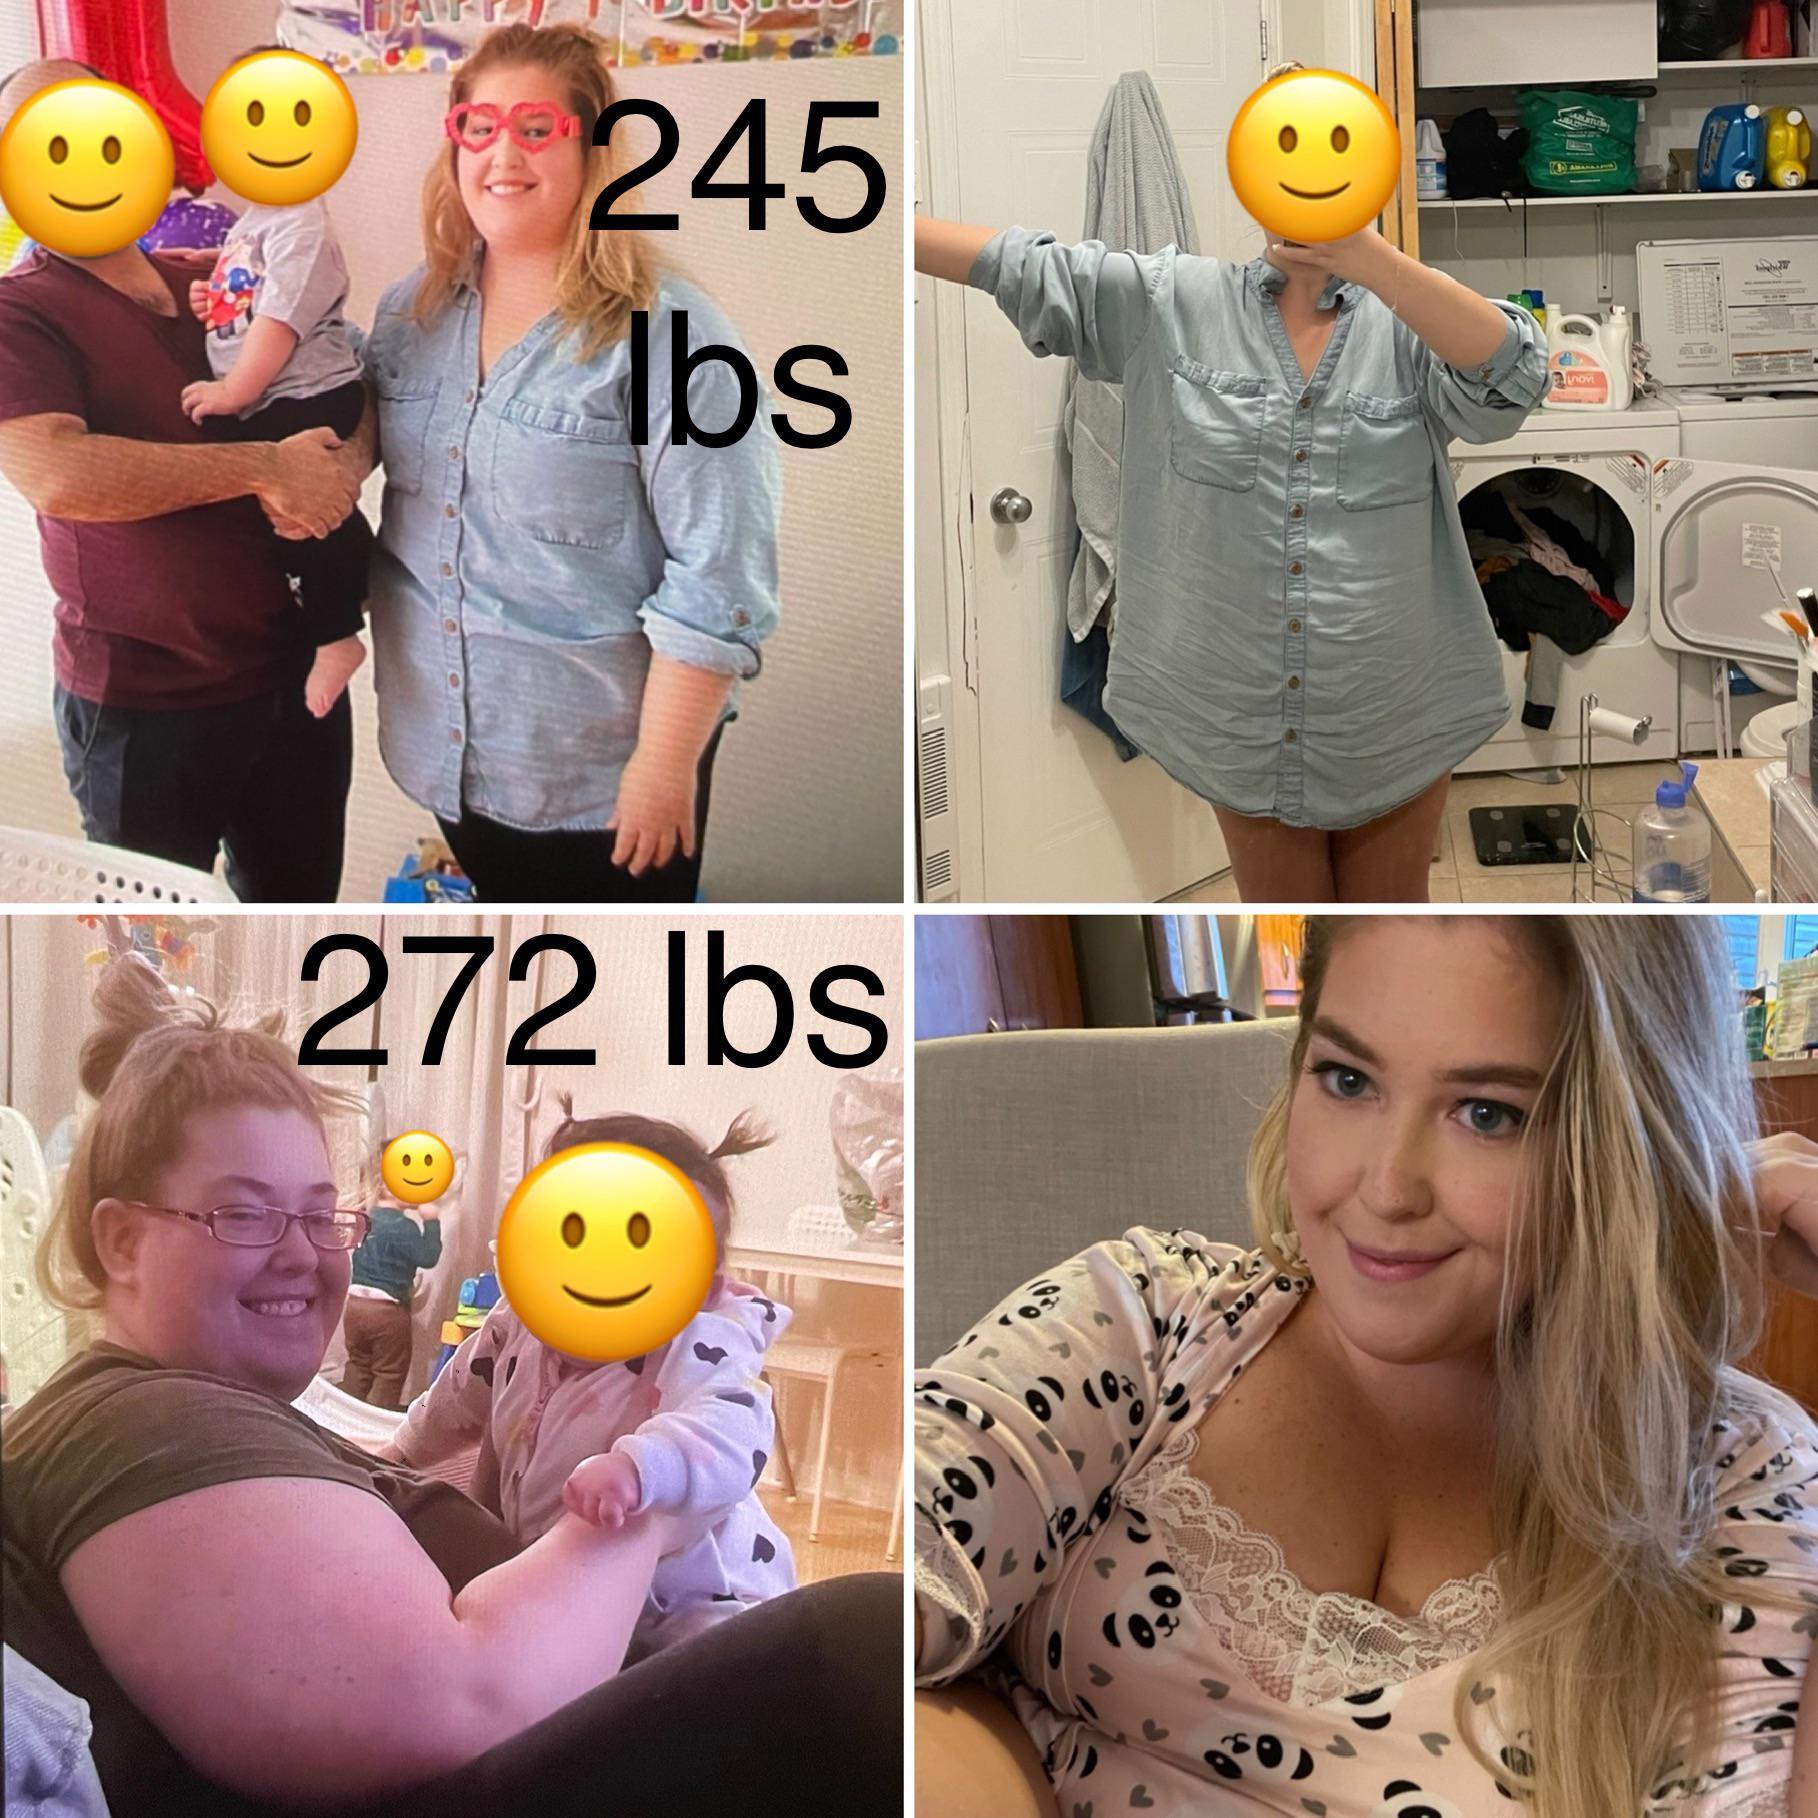 Progress Pics of 75 lbs Weight Loss 5 feet 4 Female 274 lbs to 199 lbs